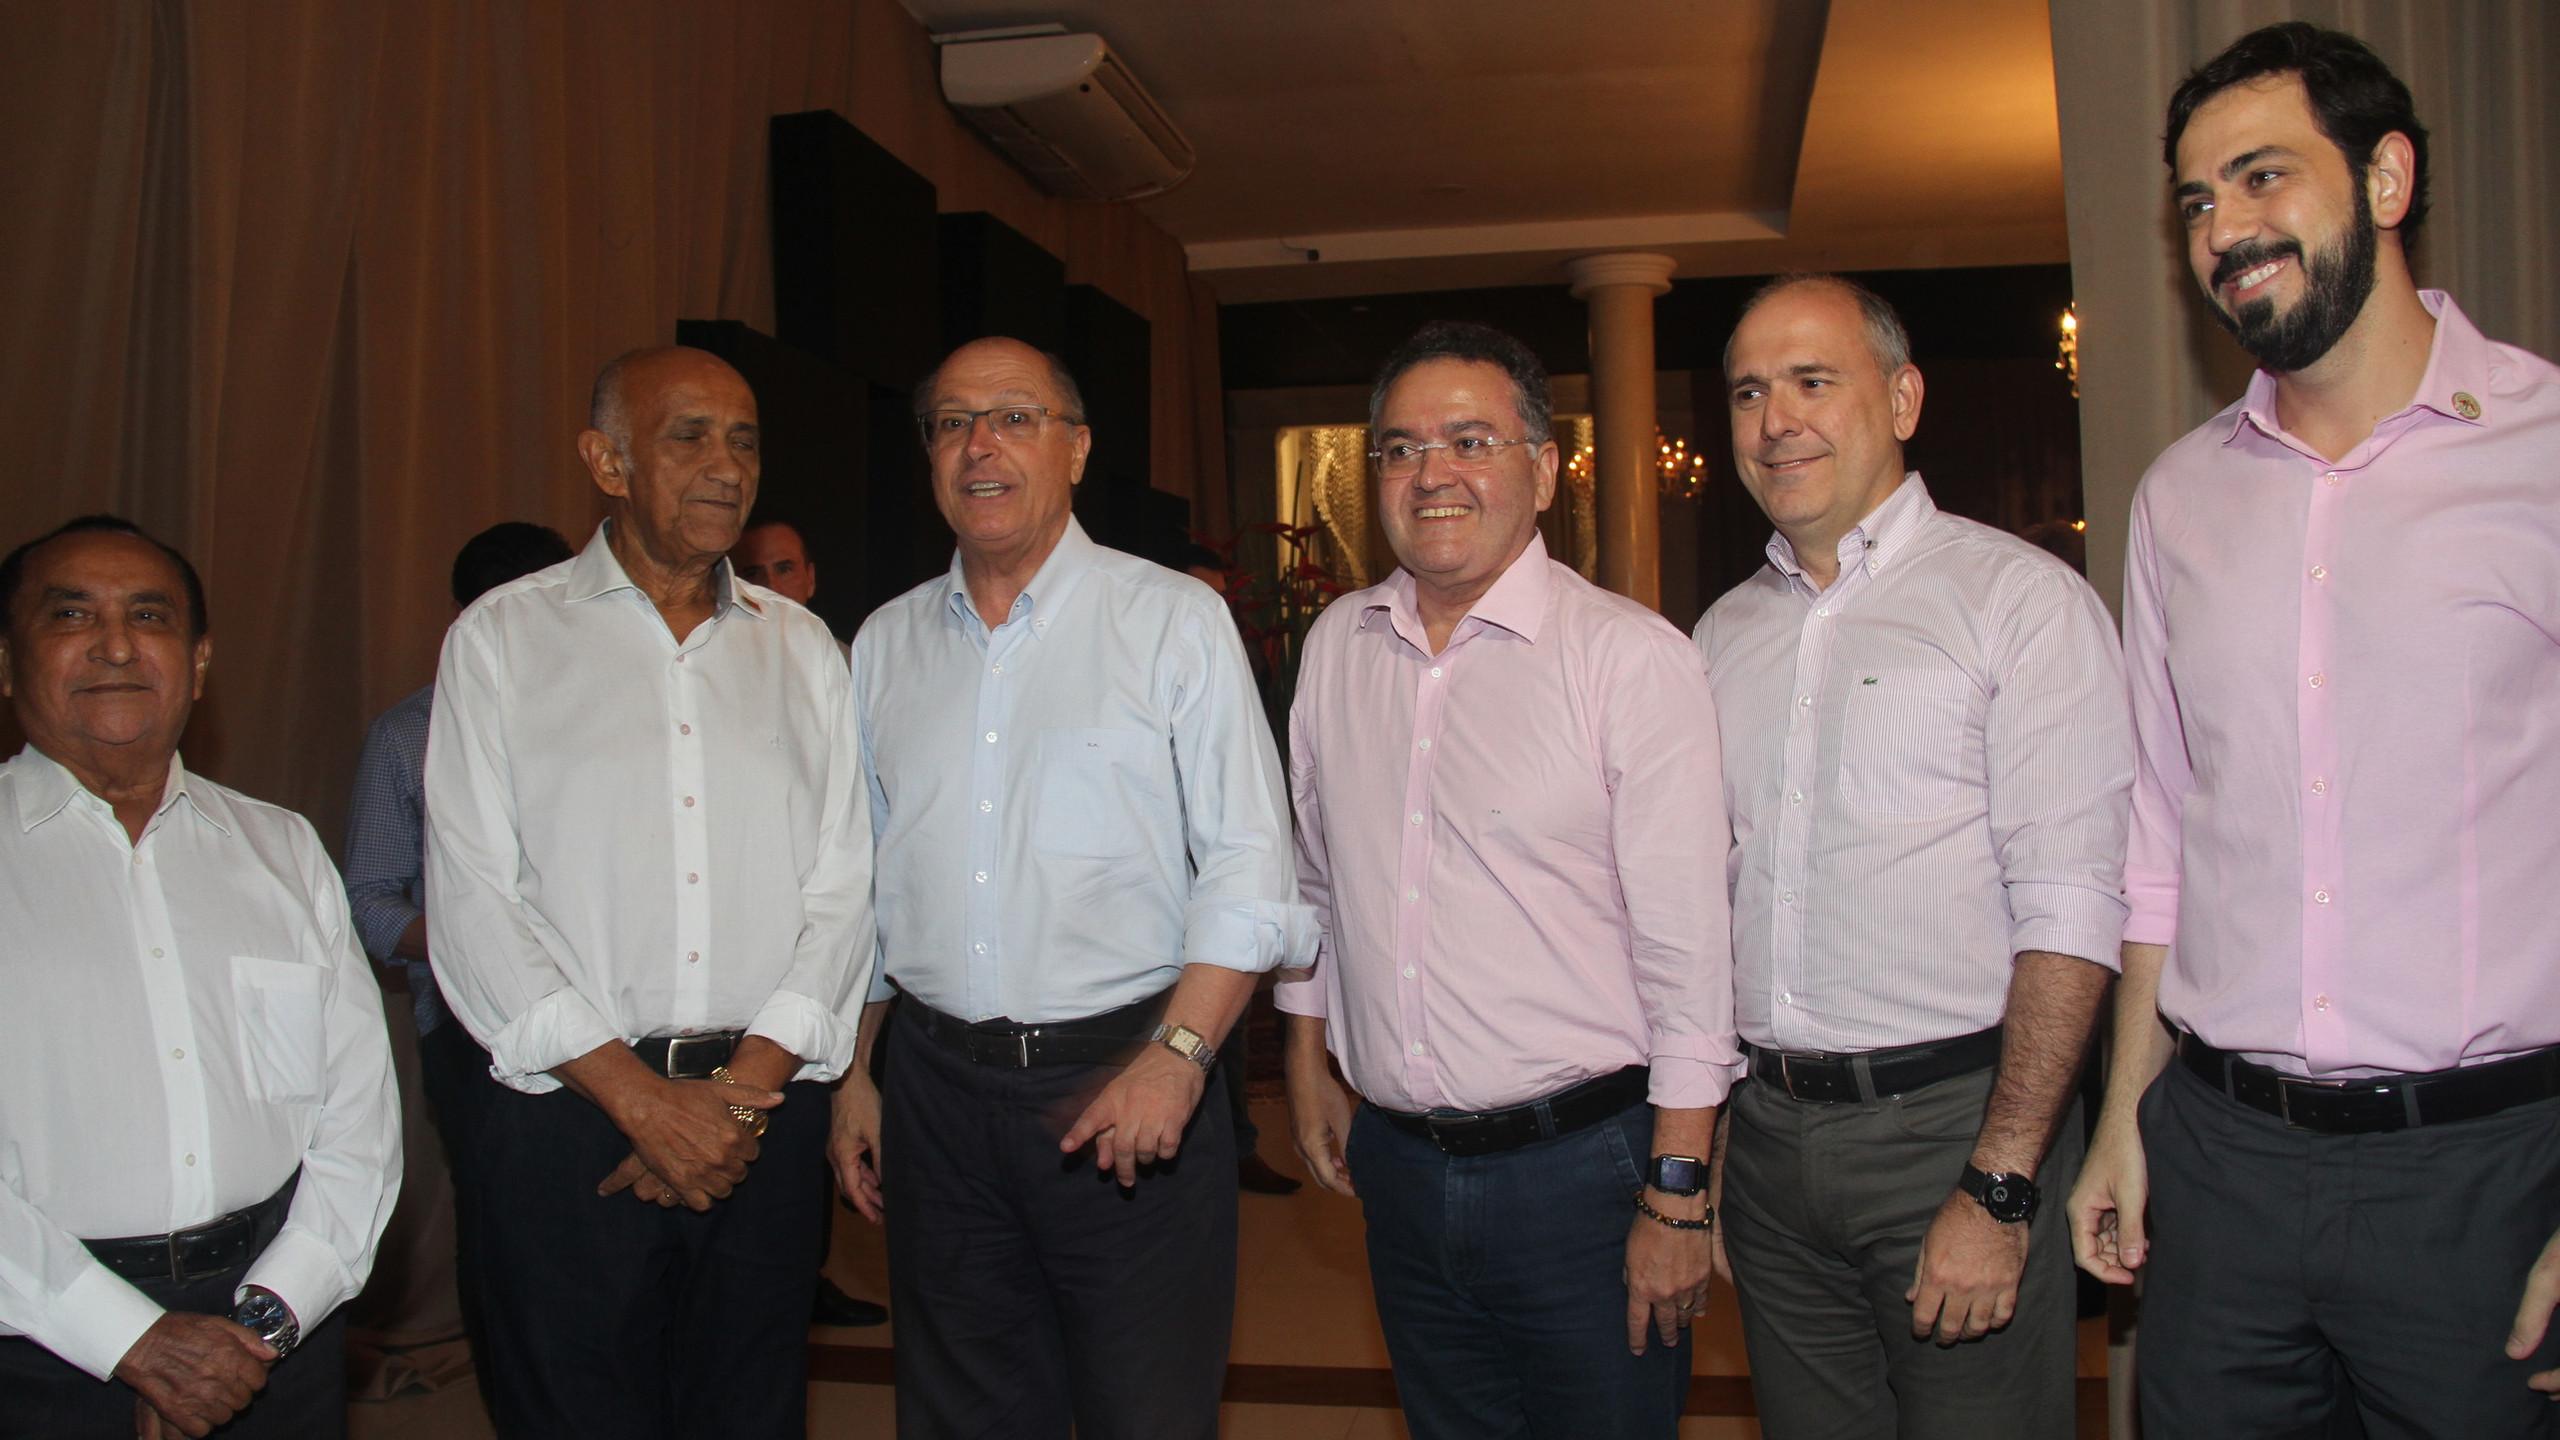 O ex-governador paulista Geraldo Alckmin (PSDB) e seu candidato declarado ao Senado Roberto Rocha, entre os líderes empresariais organizadores do evento.